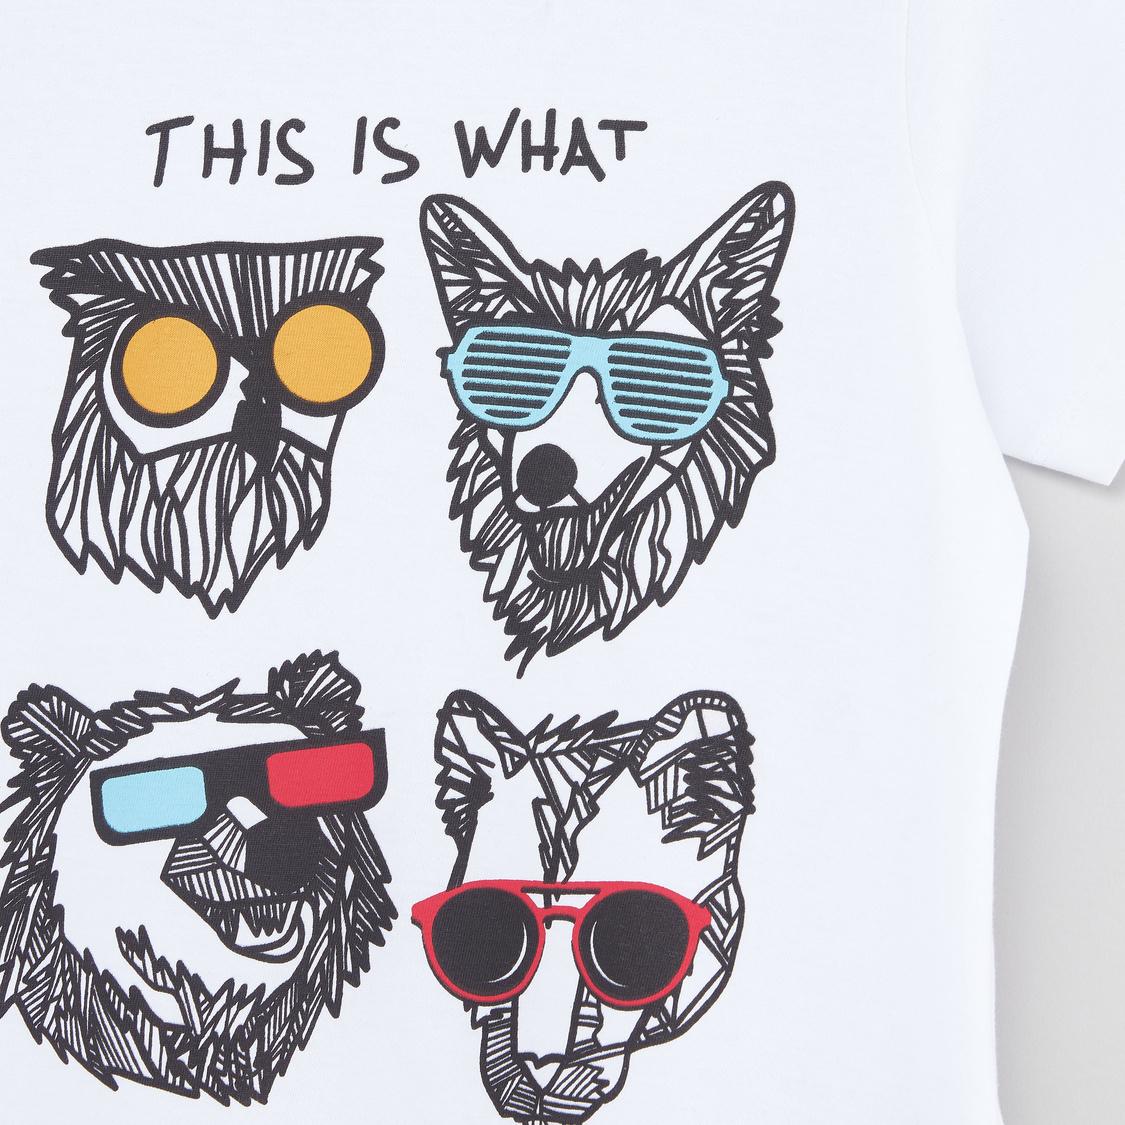 Printed Short Sleeves T-shirt with Full Length Jog Pants